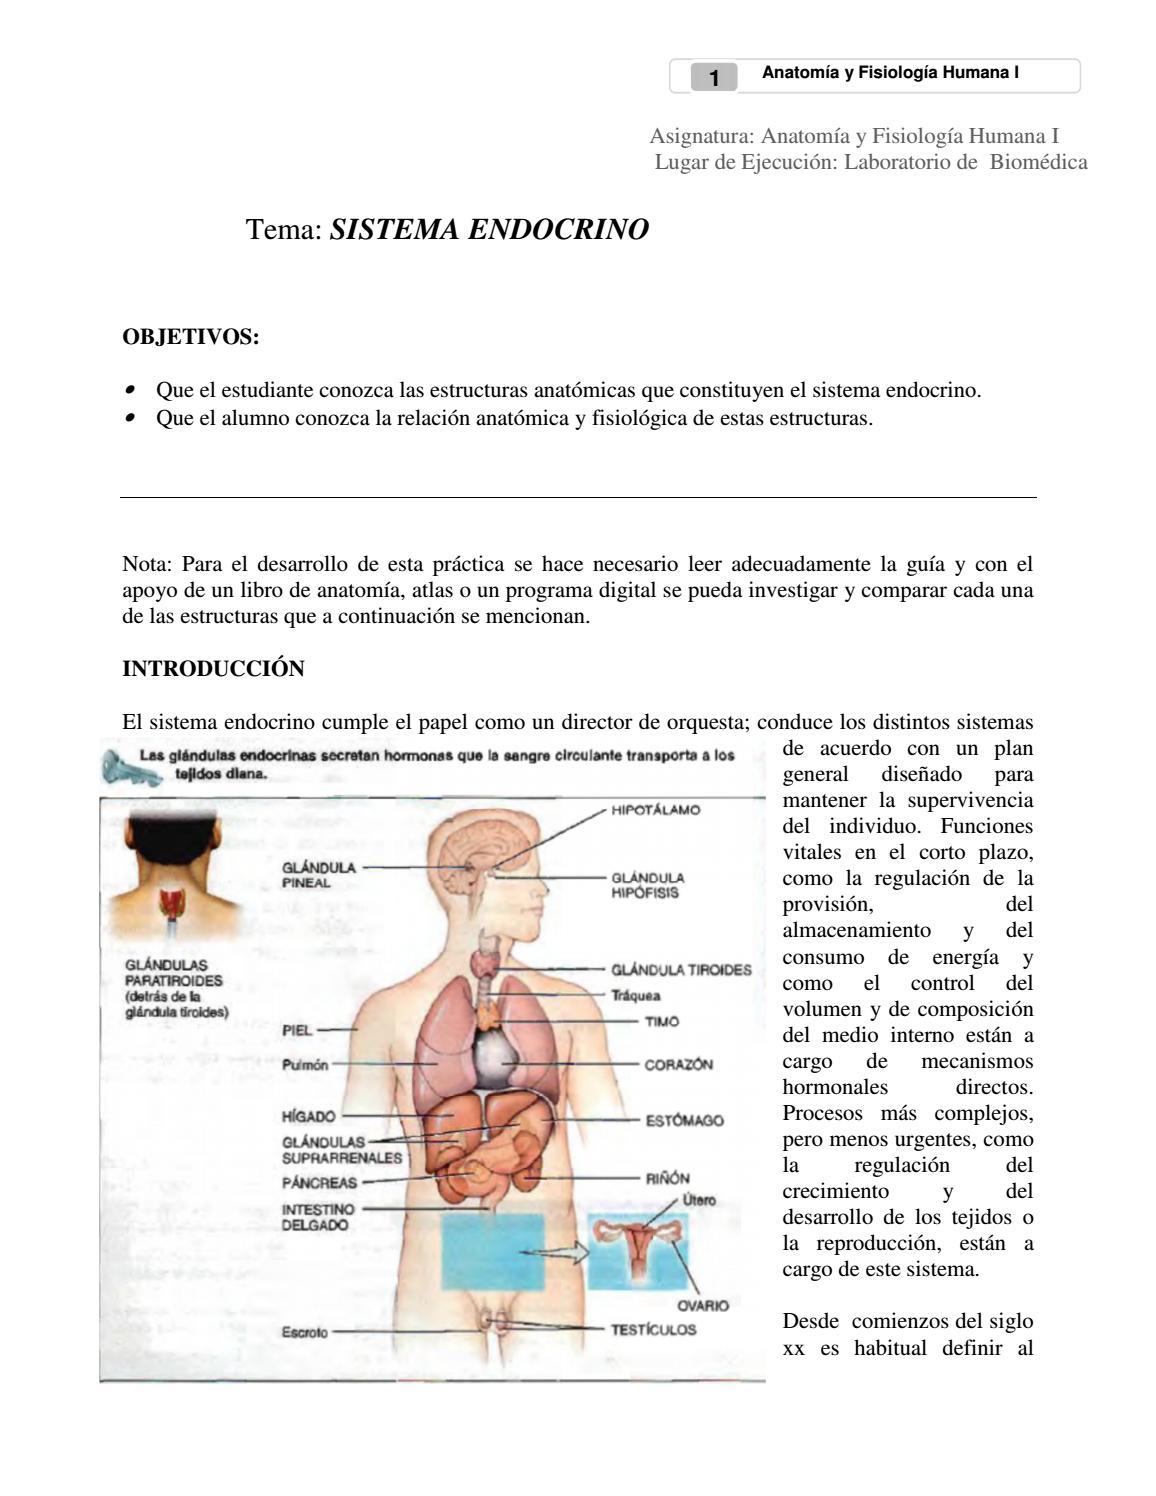 Sistema endocrino by Viviana - issuu